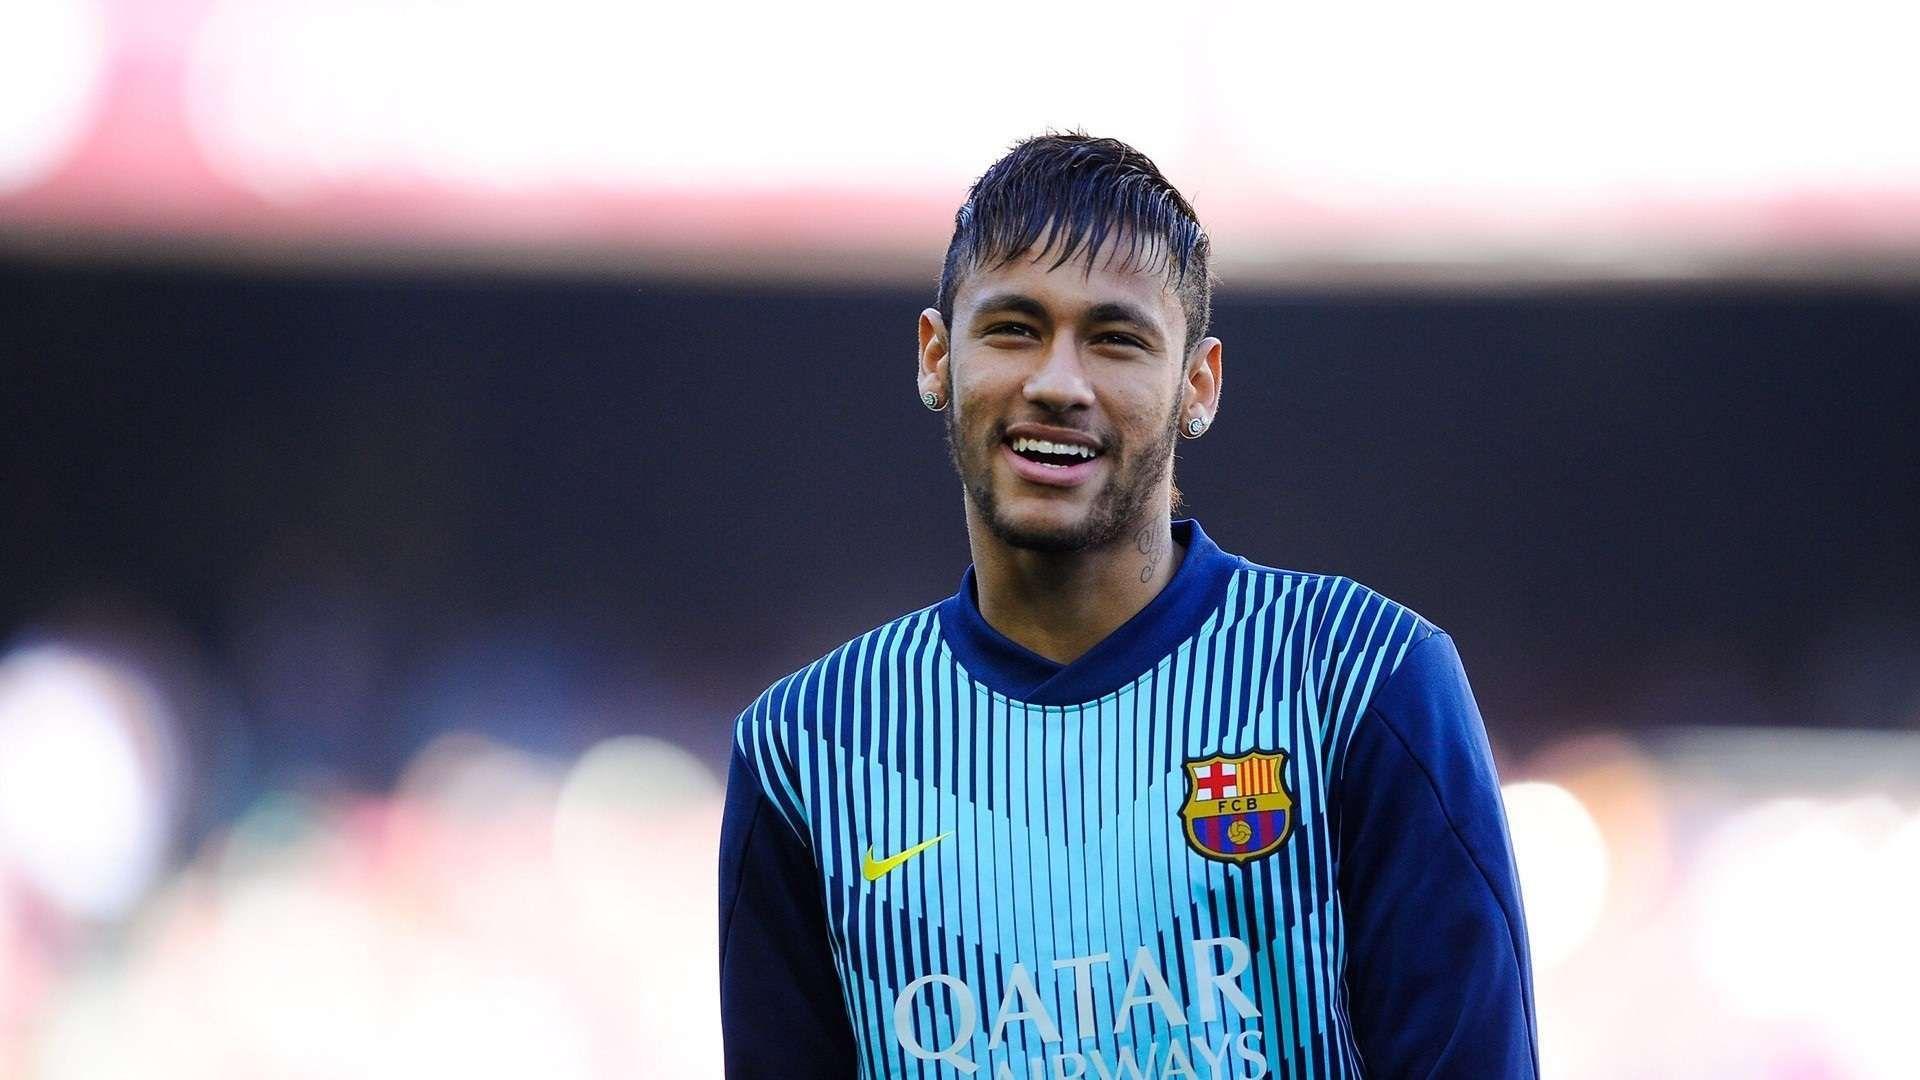 Neymar Jr Wallpaper 2015 Hd - WallpaperSafari